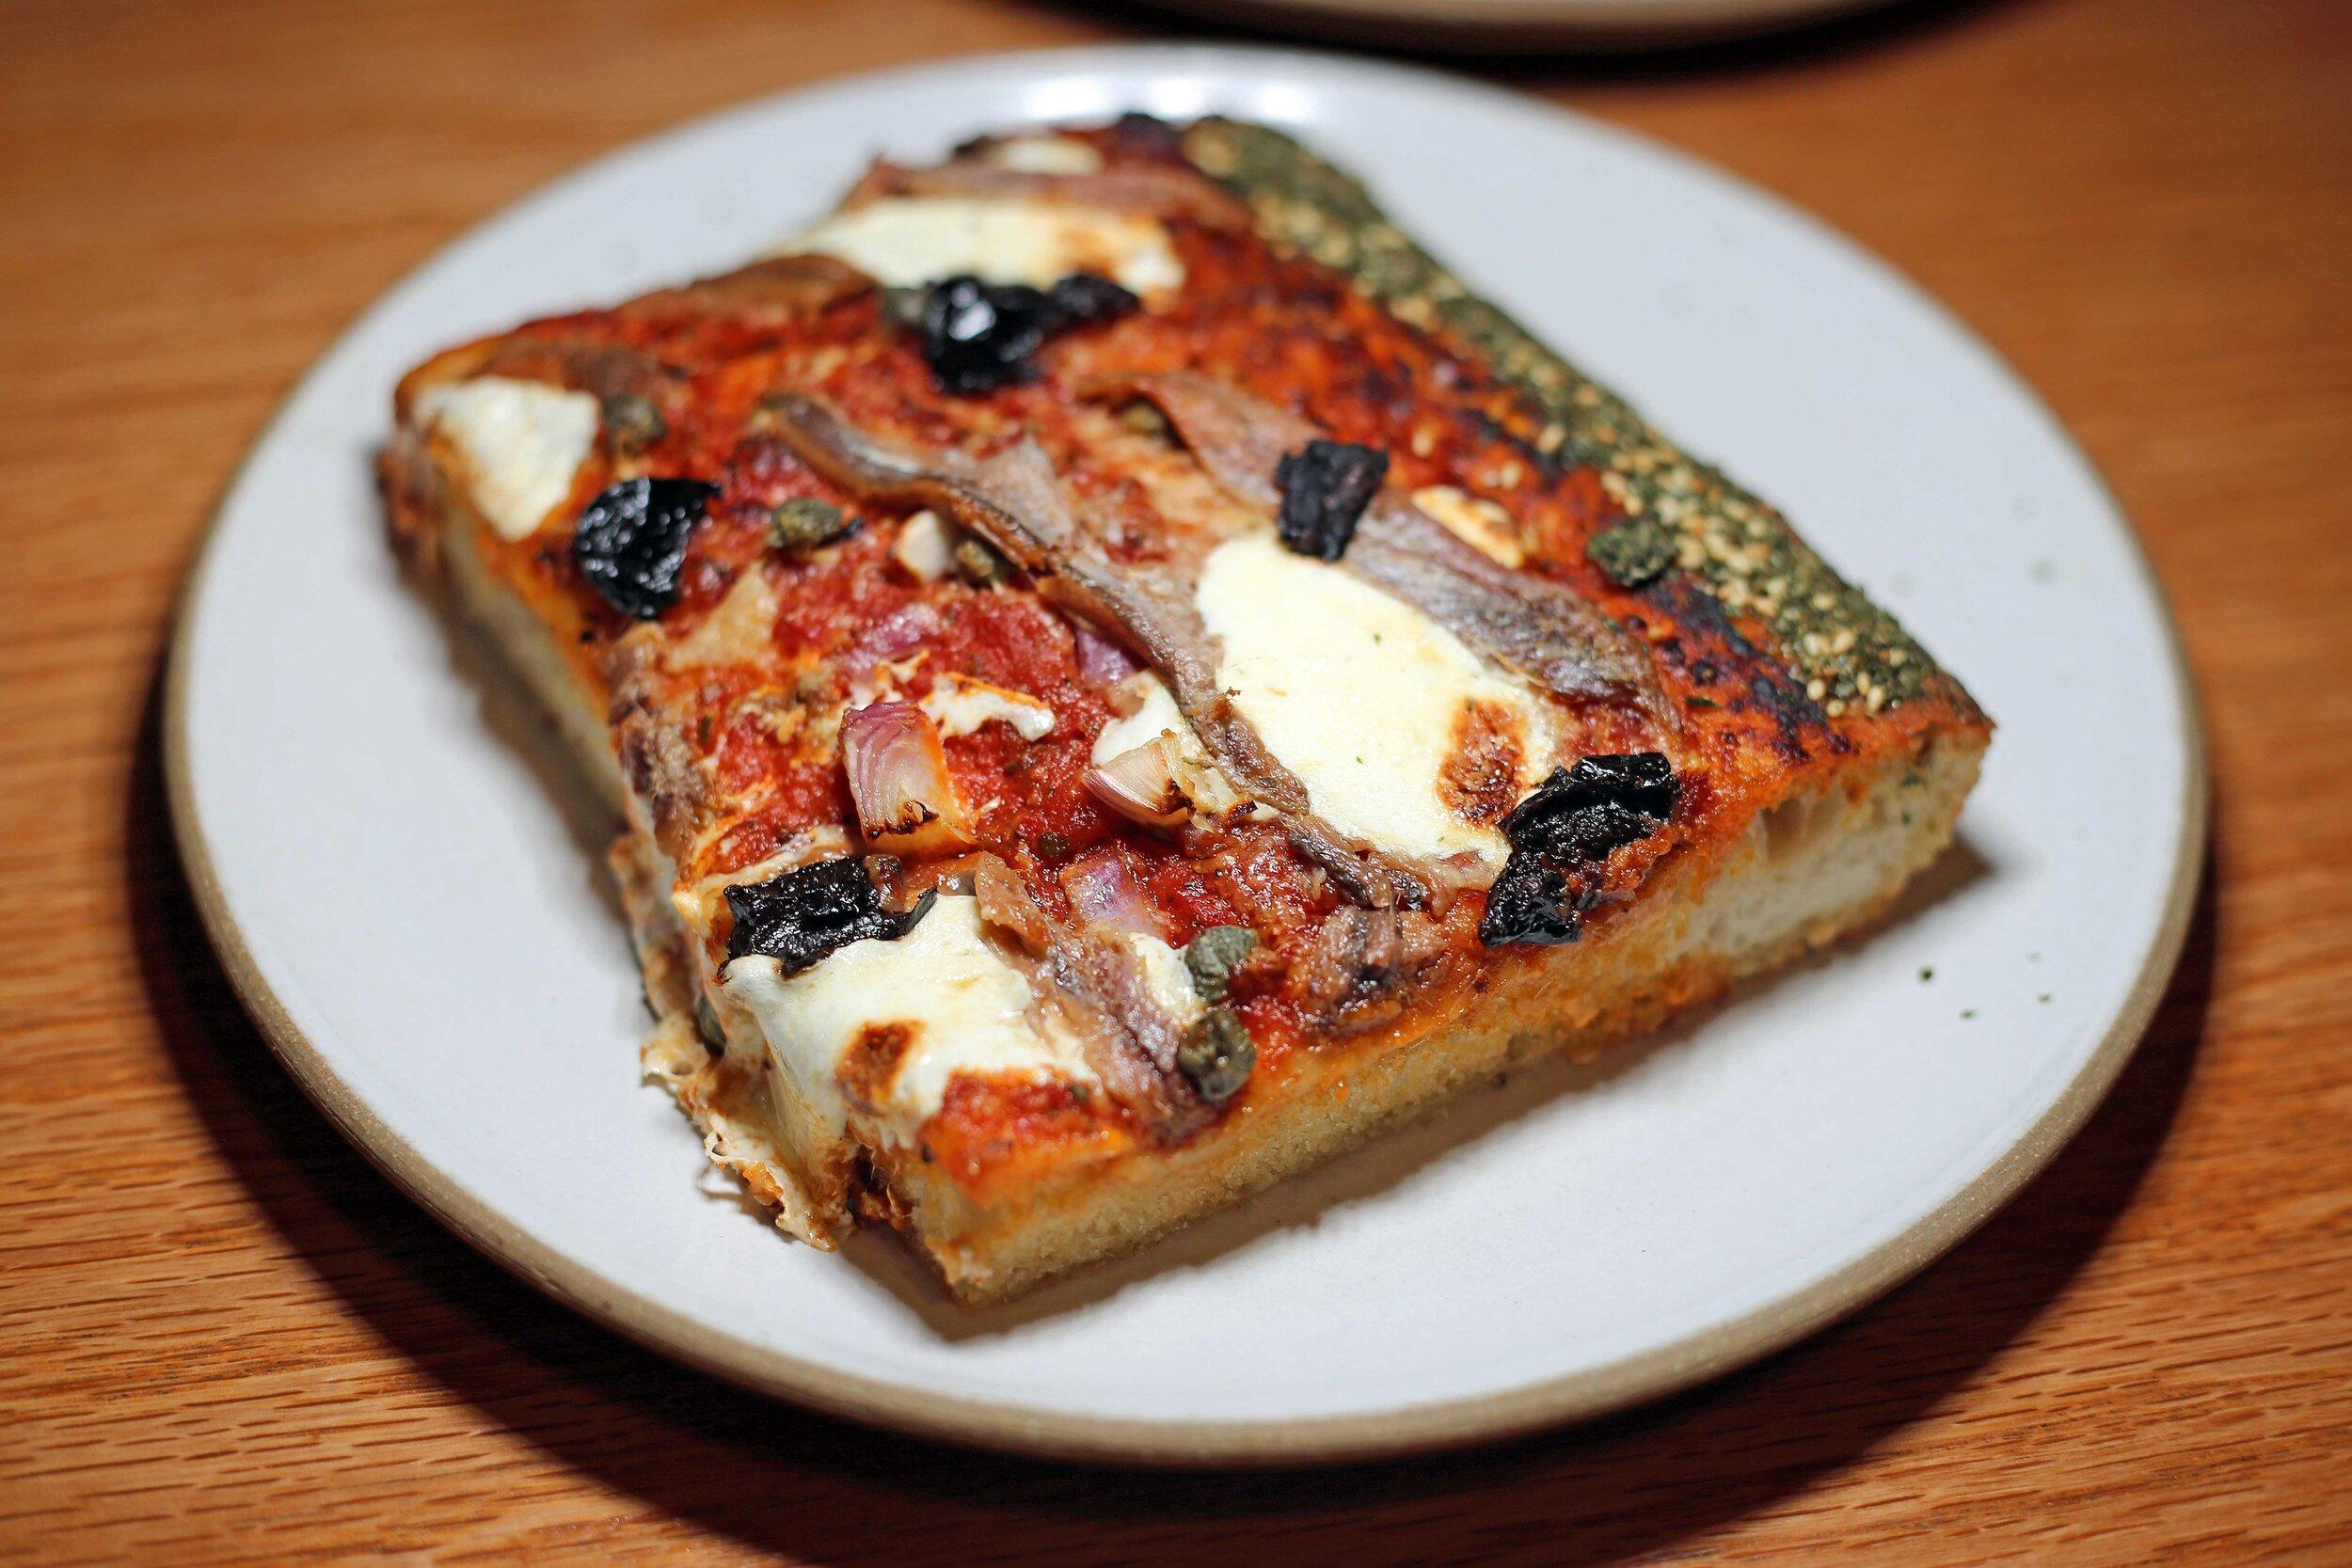 The Puttanesca: olives, anchovies, and furikake seasoning.